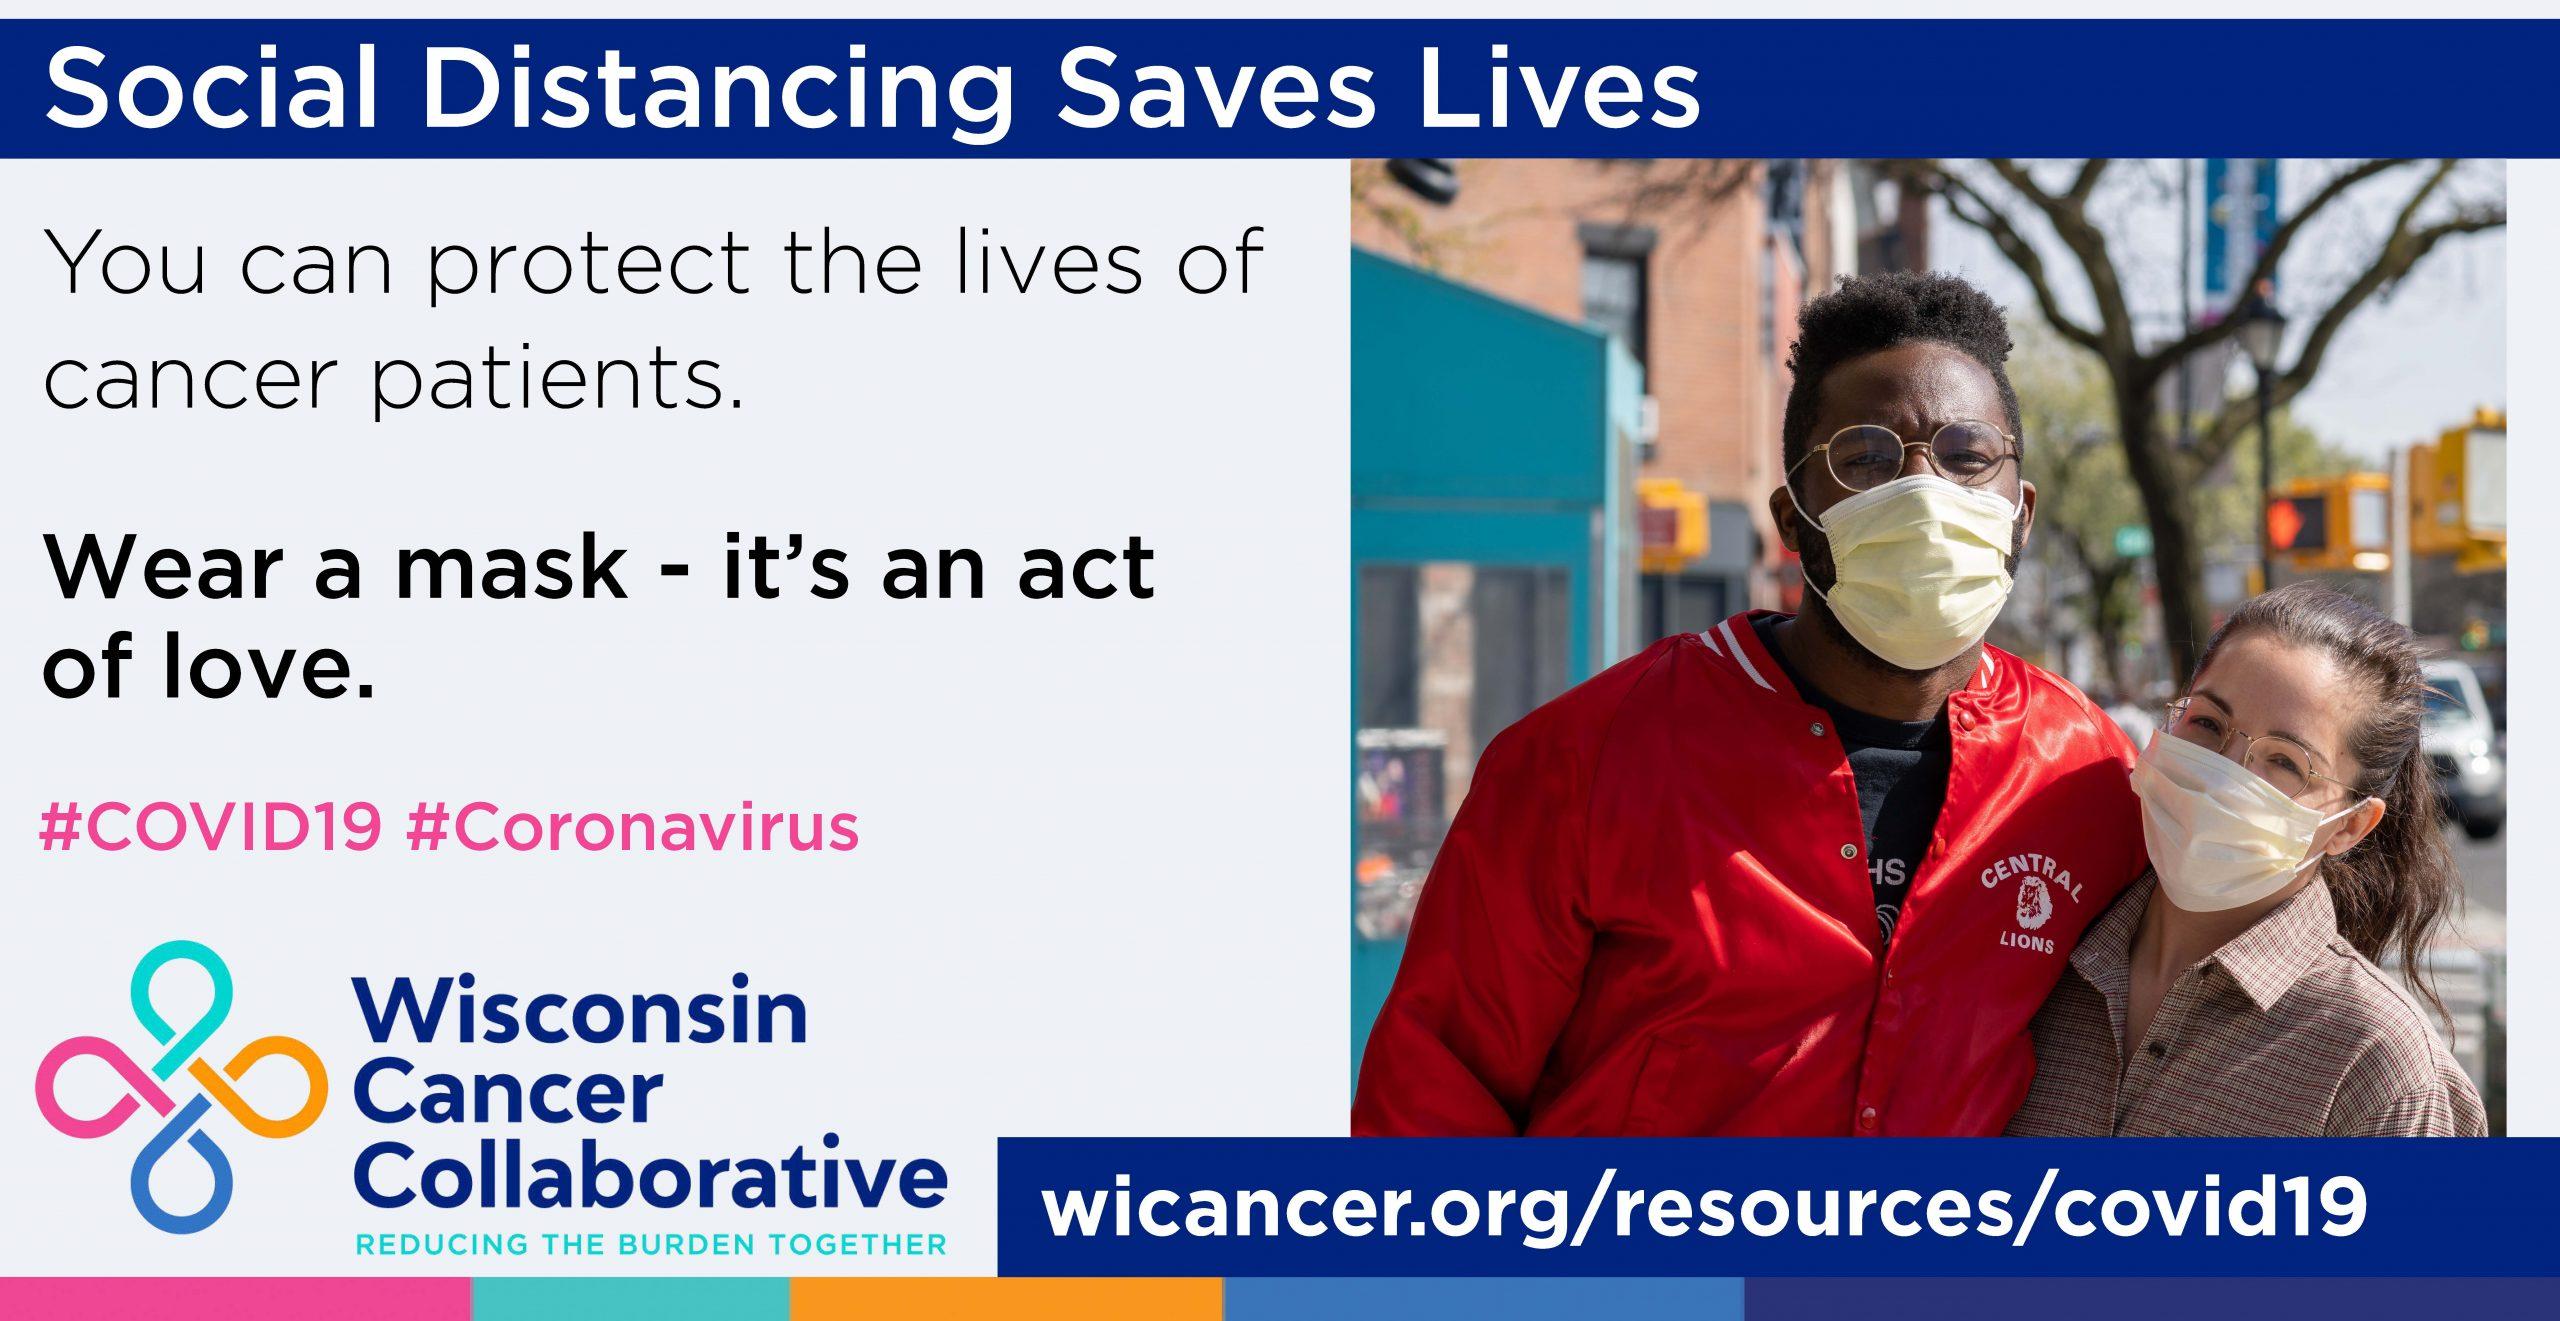 Socia Distancing Saves Lives